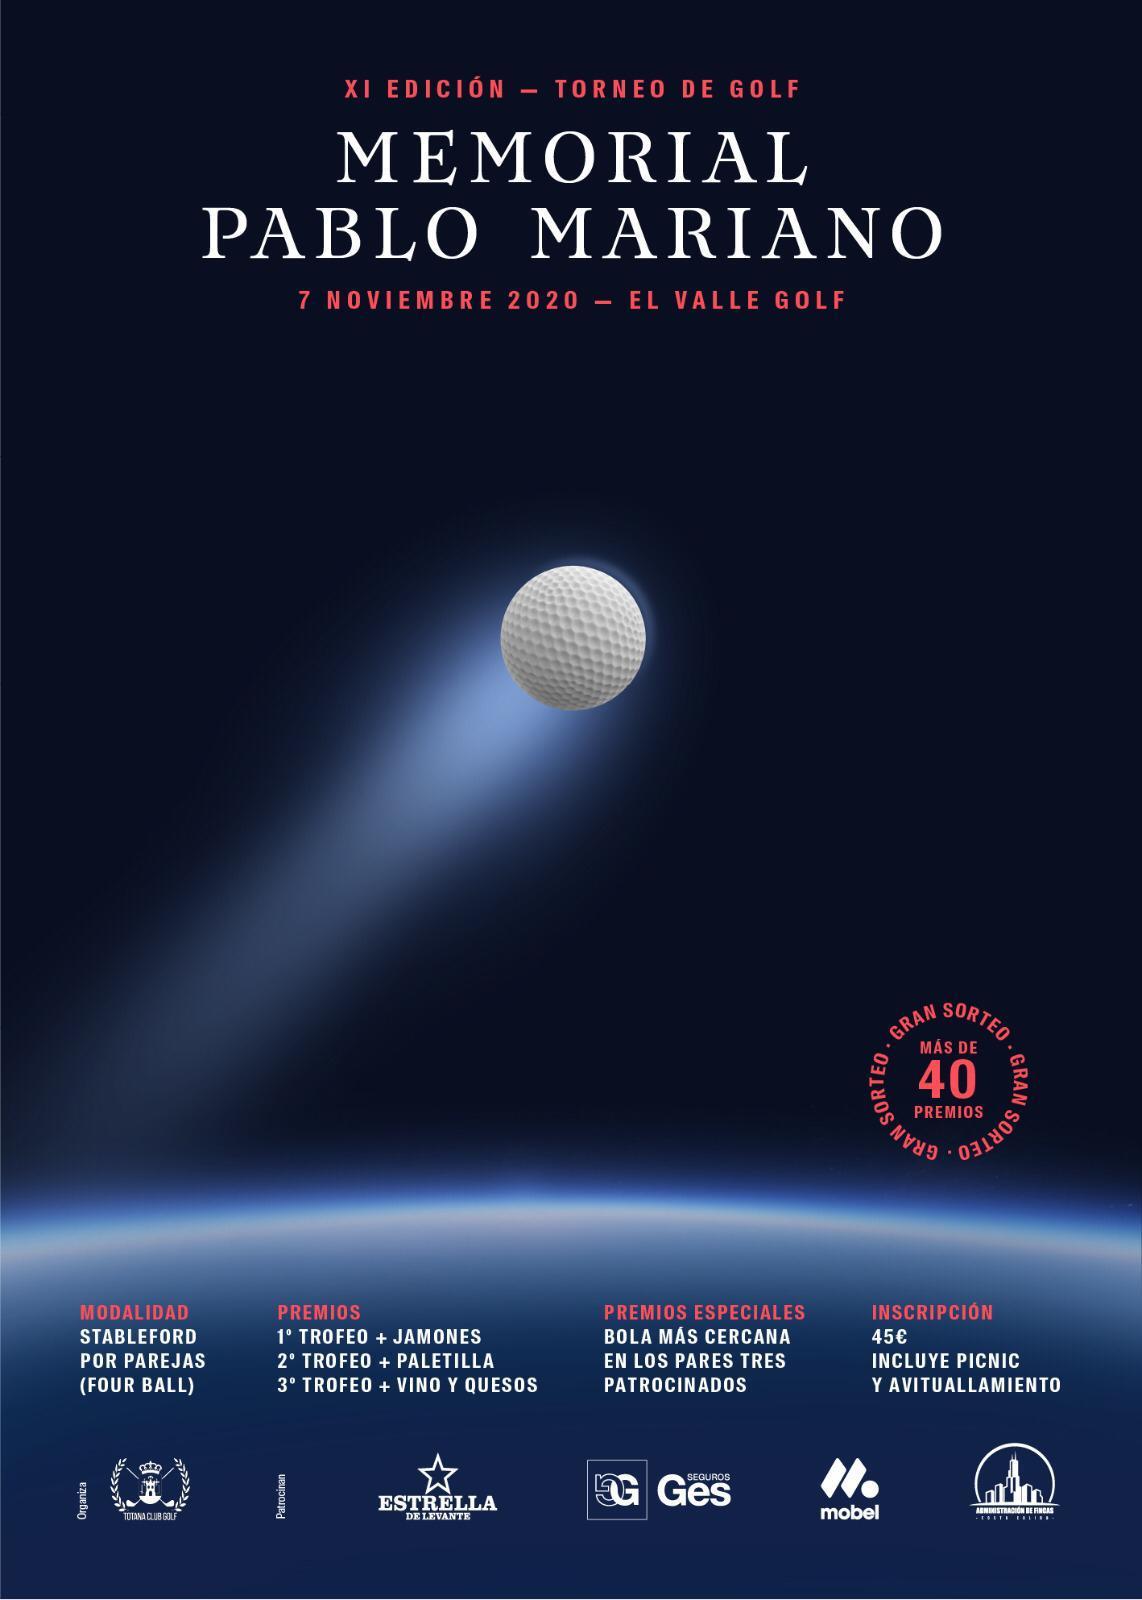 201107 VAL, Cartel del torneo